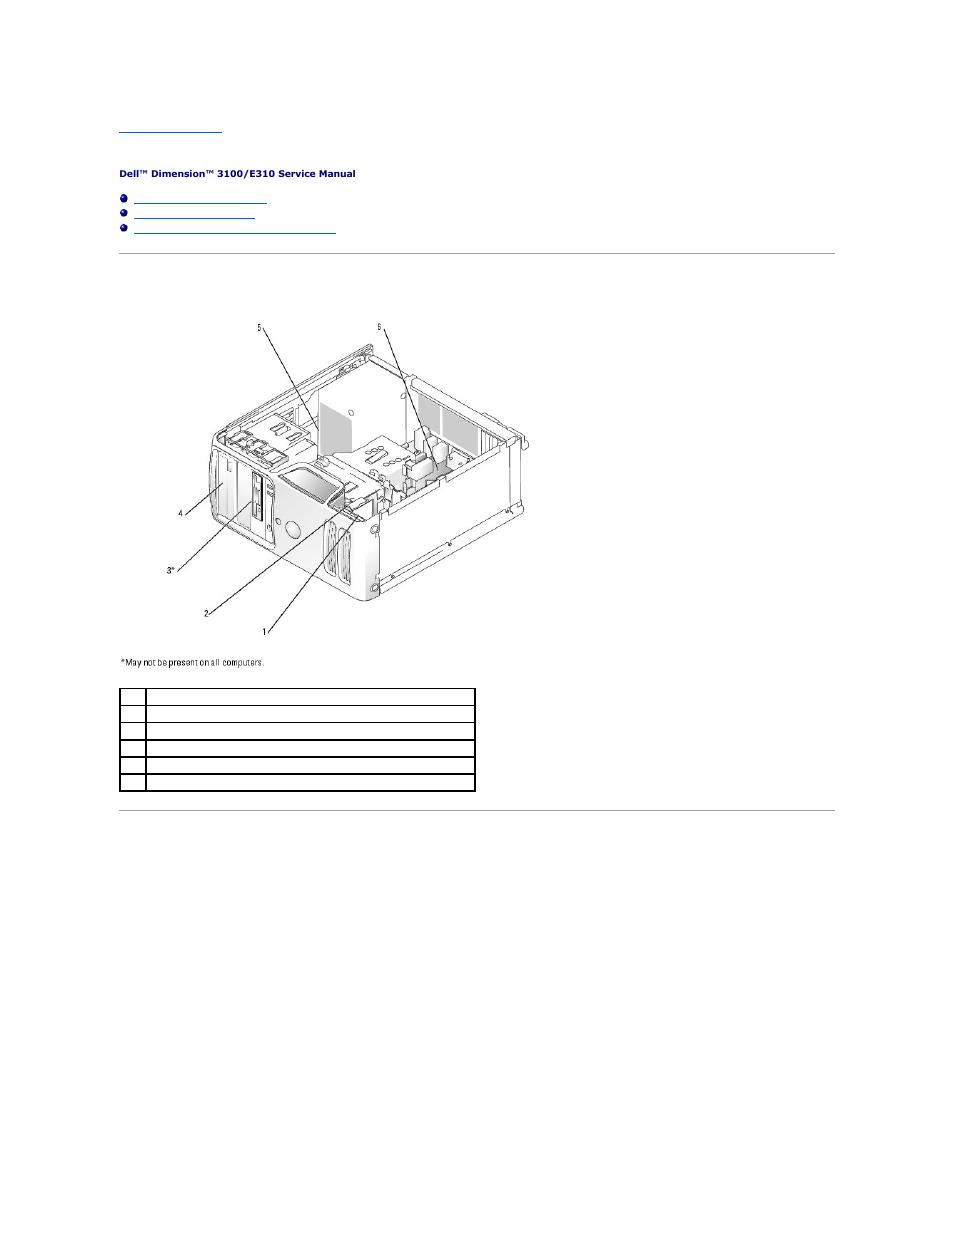 technical overview inside view of your computer system board rh manualsdir com dell dimension 3100 manual pdf Processor for Dell Dimension E-310